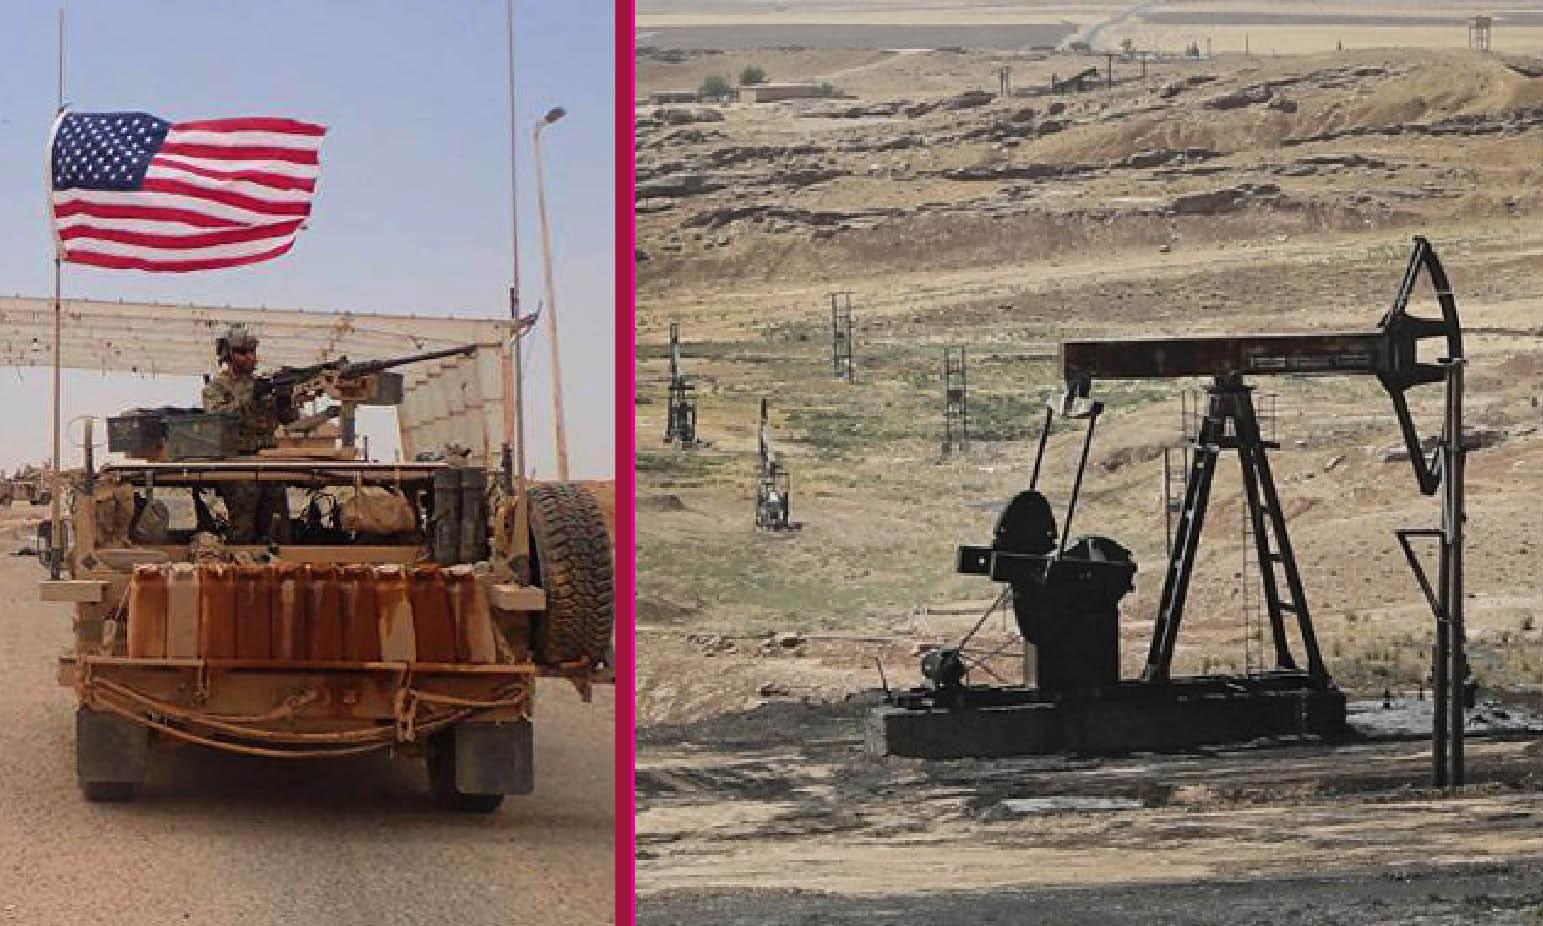 SYRIA: THE US CRIMINAL SCHEME FOR SMUGGLING OIL